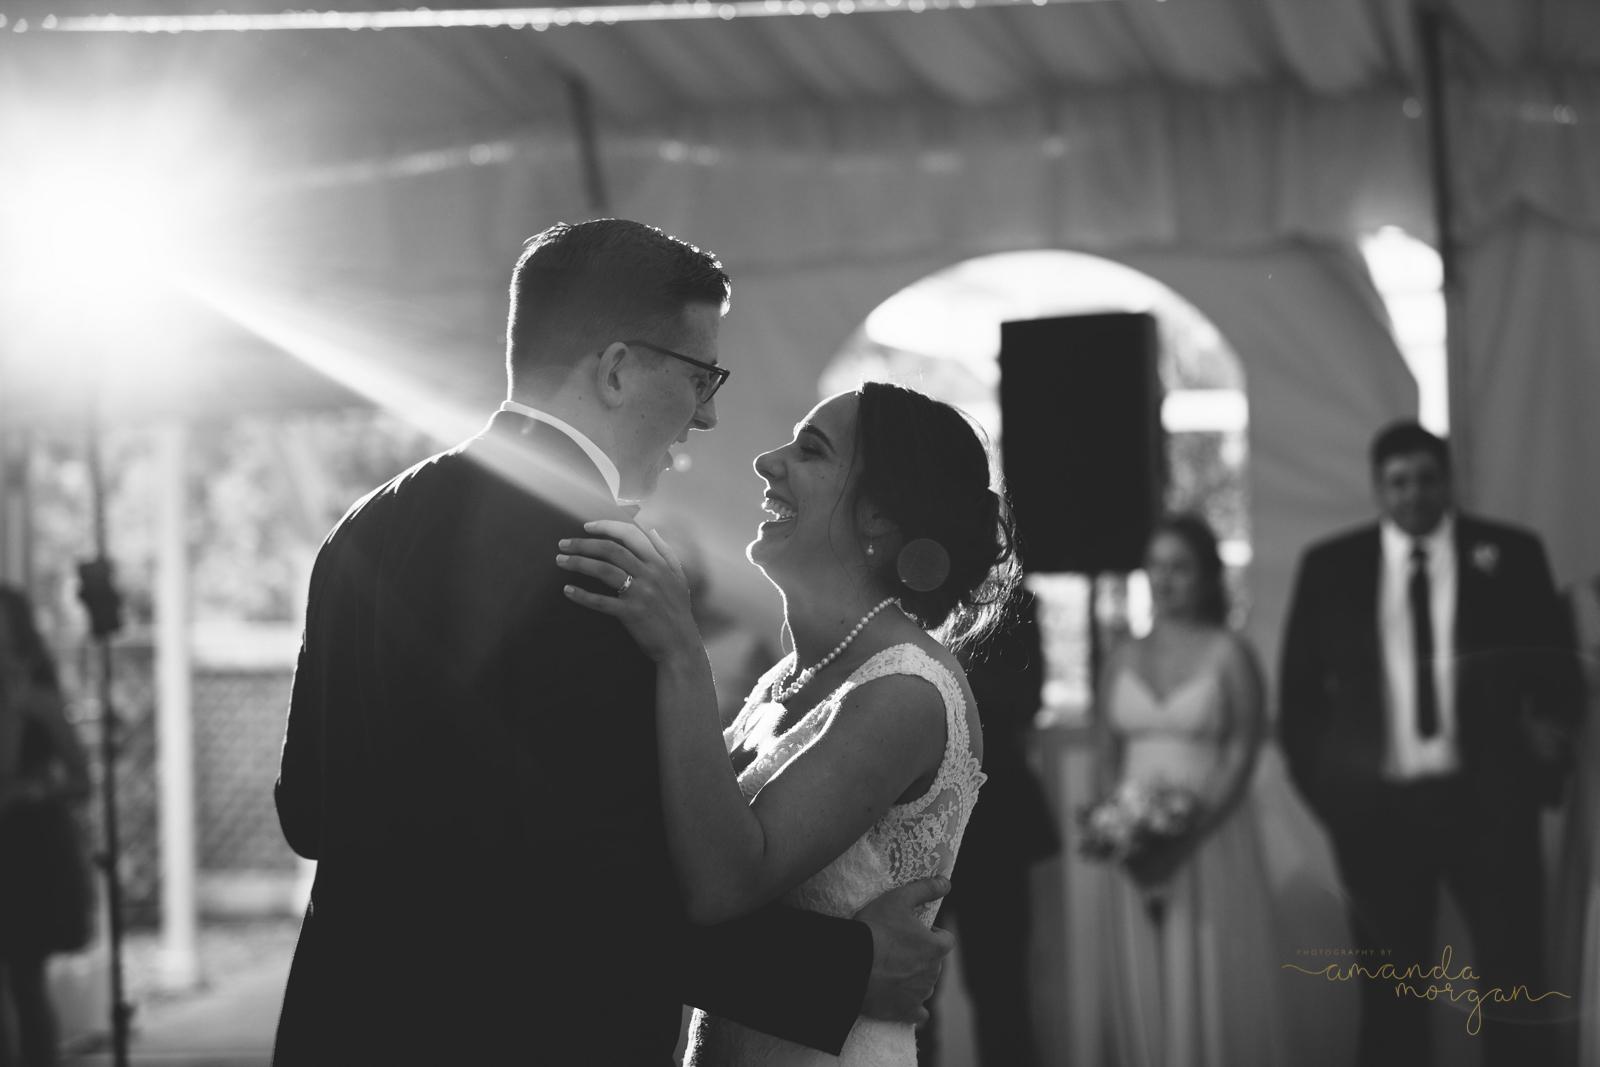 Publick-House-Wedding-Amanda-Morgan-56.jpg